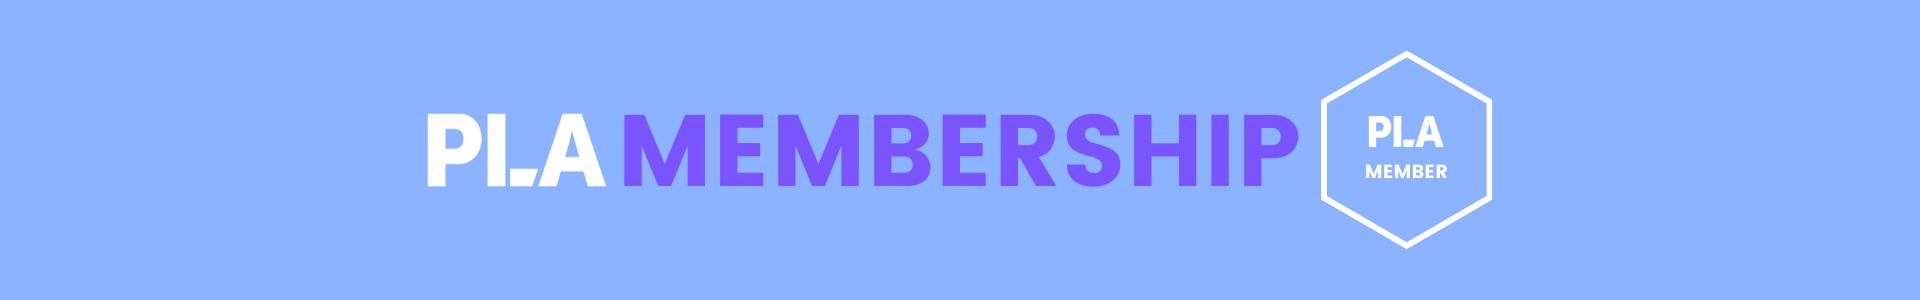 PLA Membership Plan